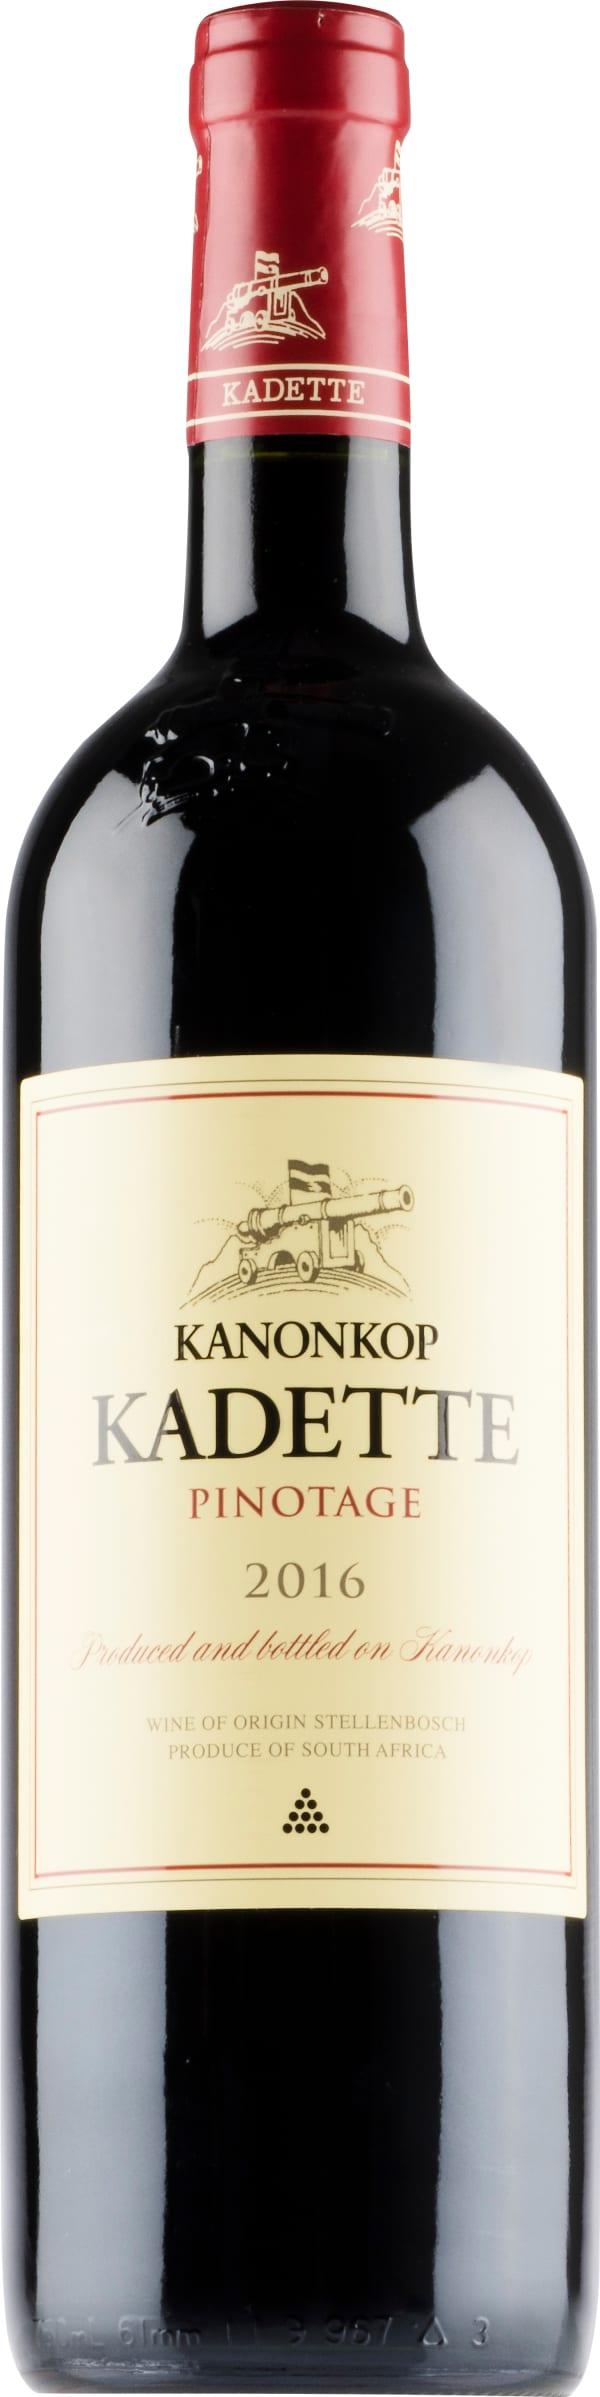 Kanonkop Kadette Pinotage 2016